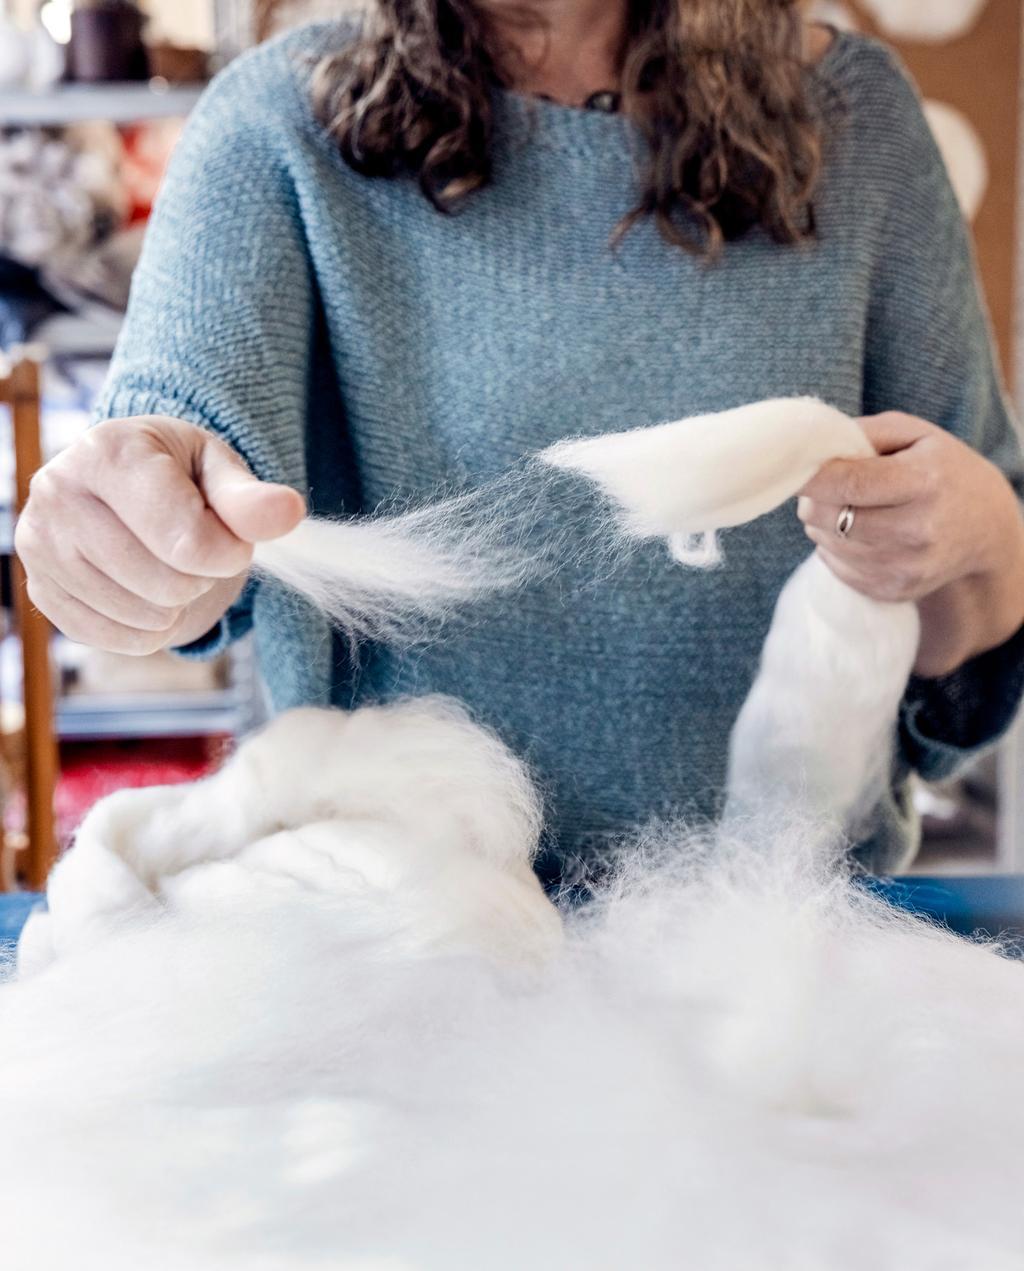 vtwonen 04-2021 | Lilian met wol in handen